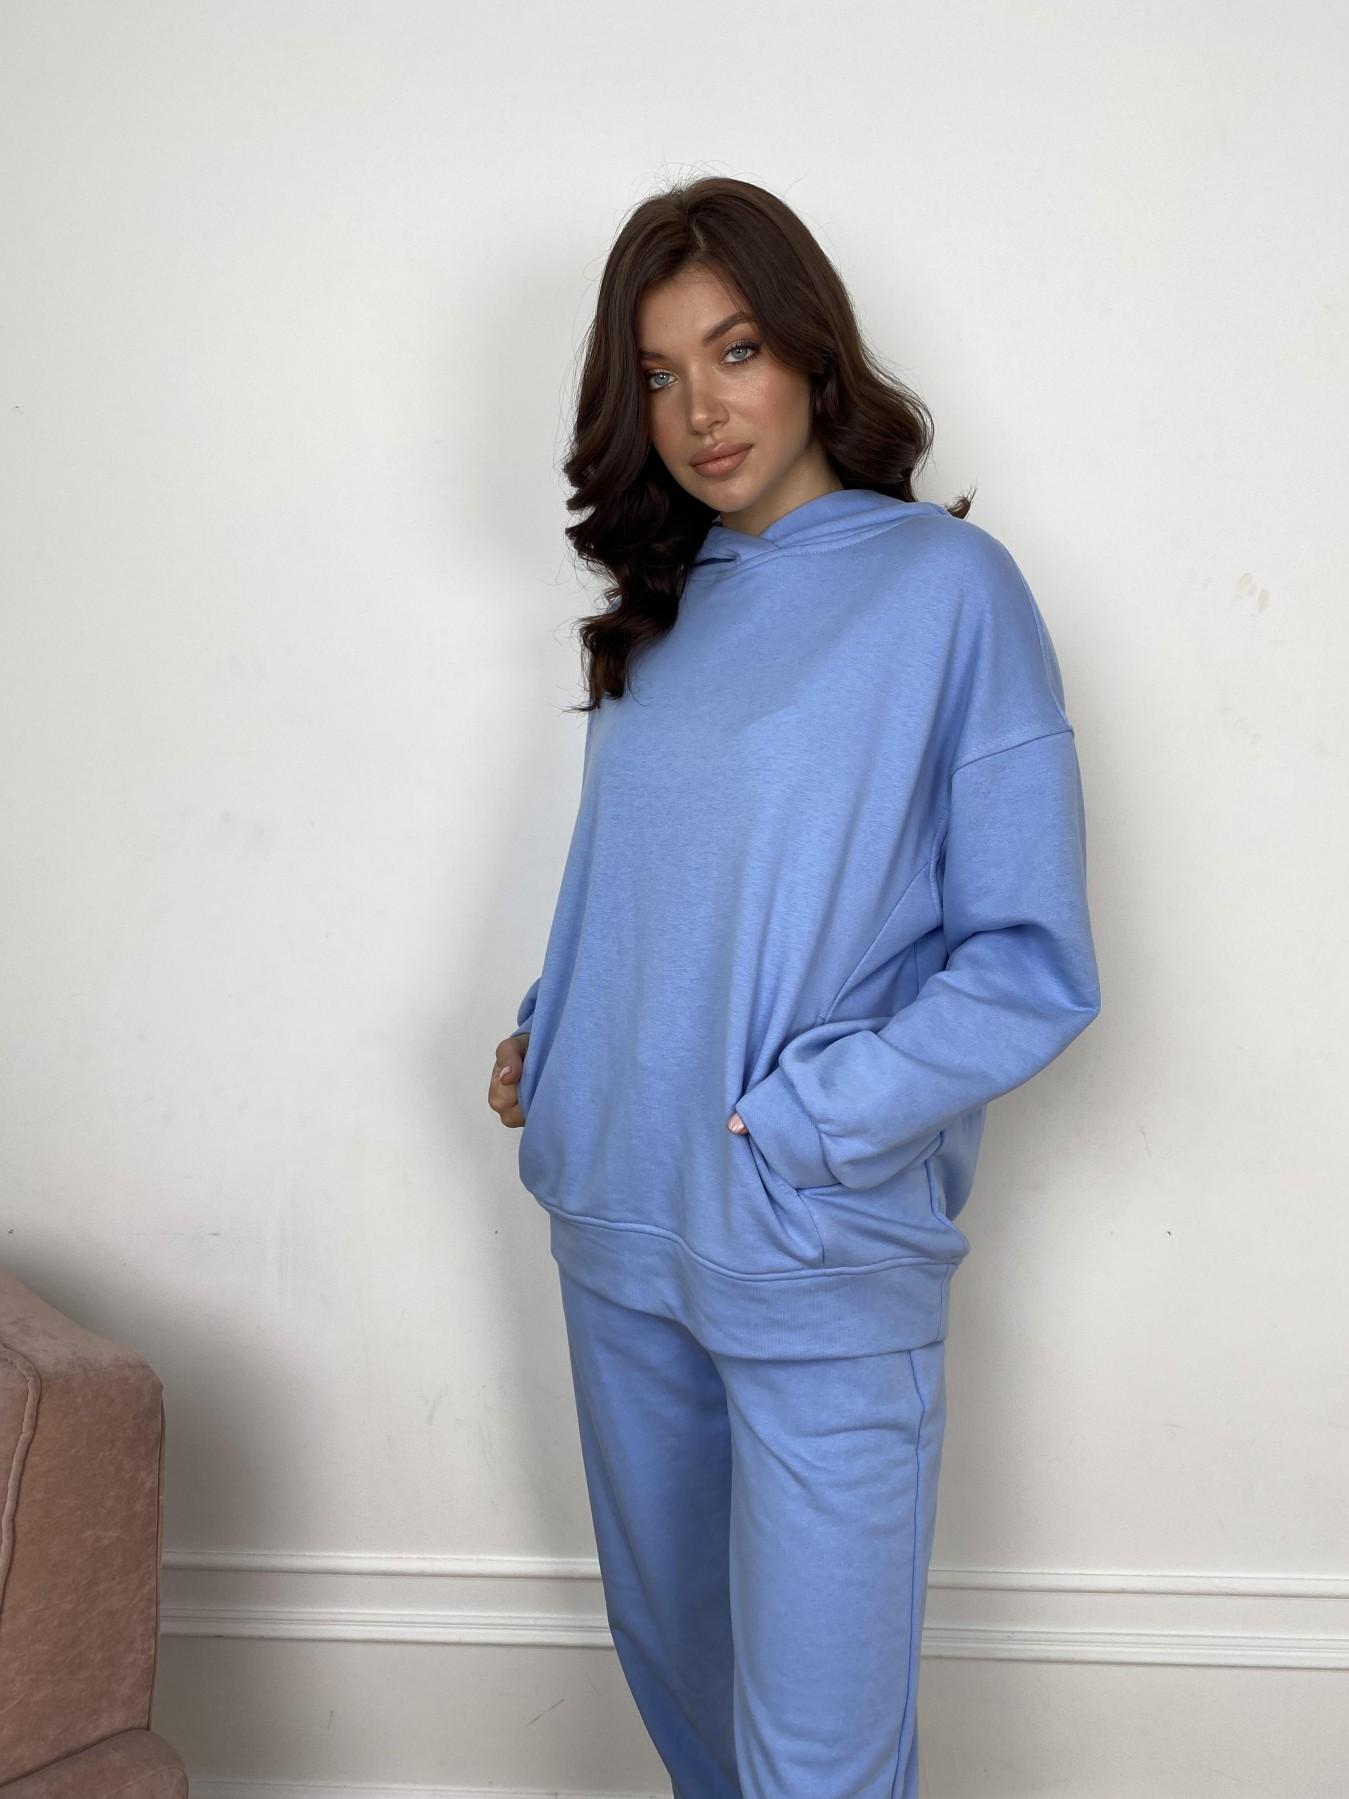 Марион костюм из 3х нитки 10581 АРТ. 46937 Цвет: Голубой - фото 1, интернет магазин tm-modus.ru